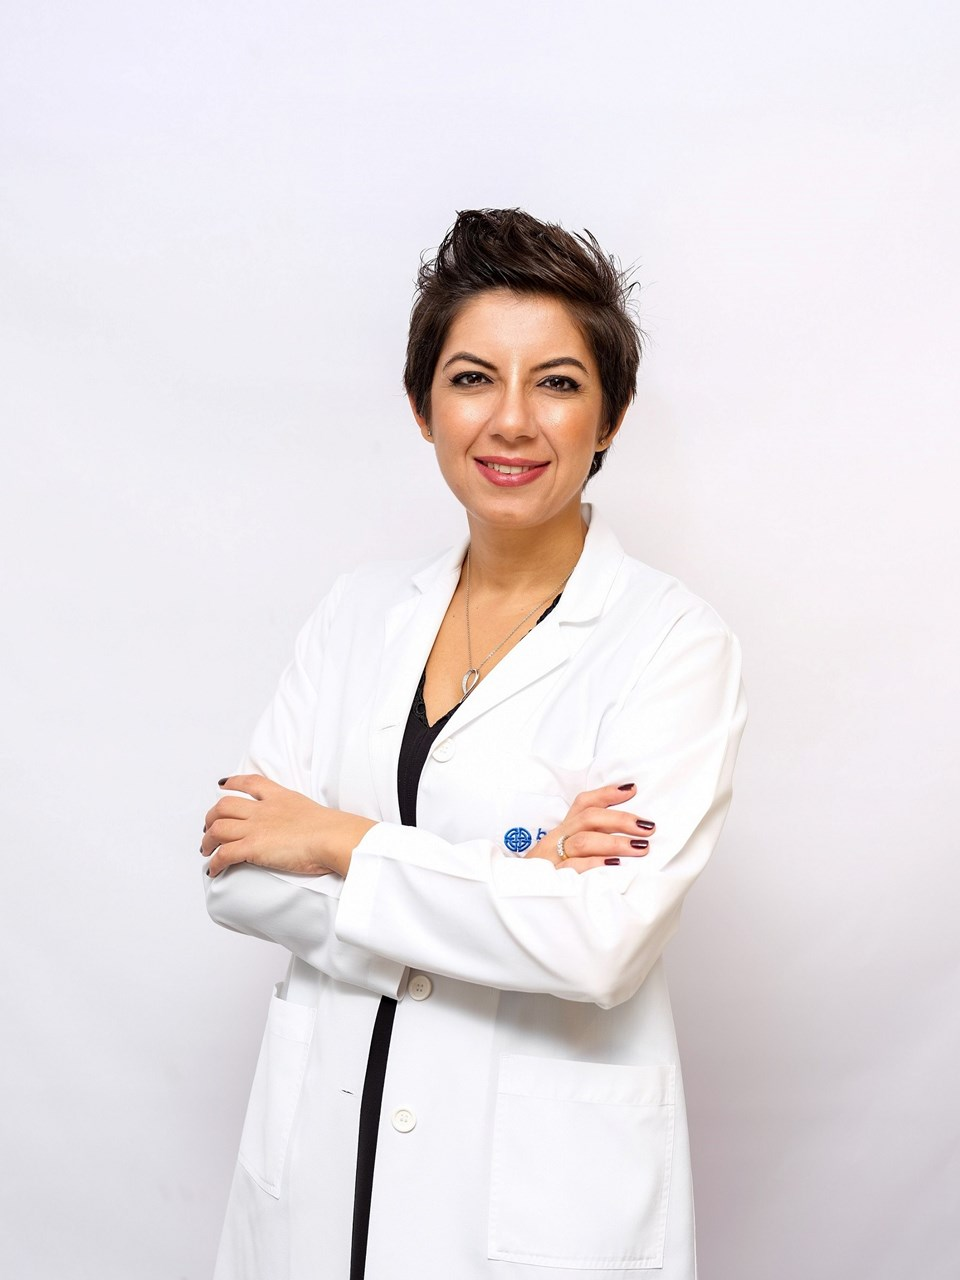 Dr. Esra Uğurlu Koçer